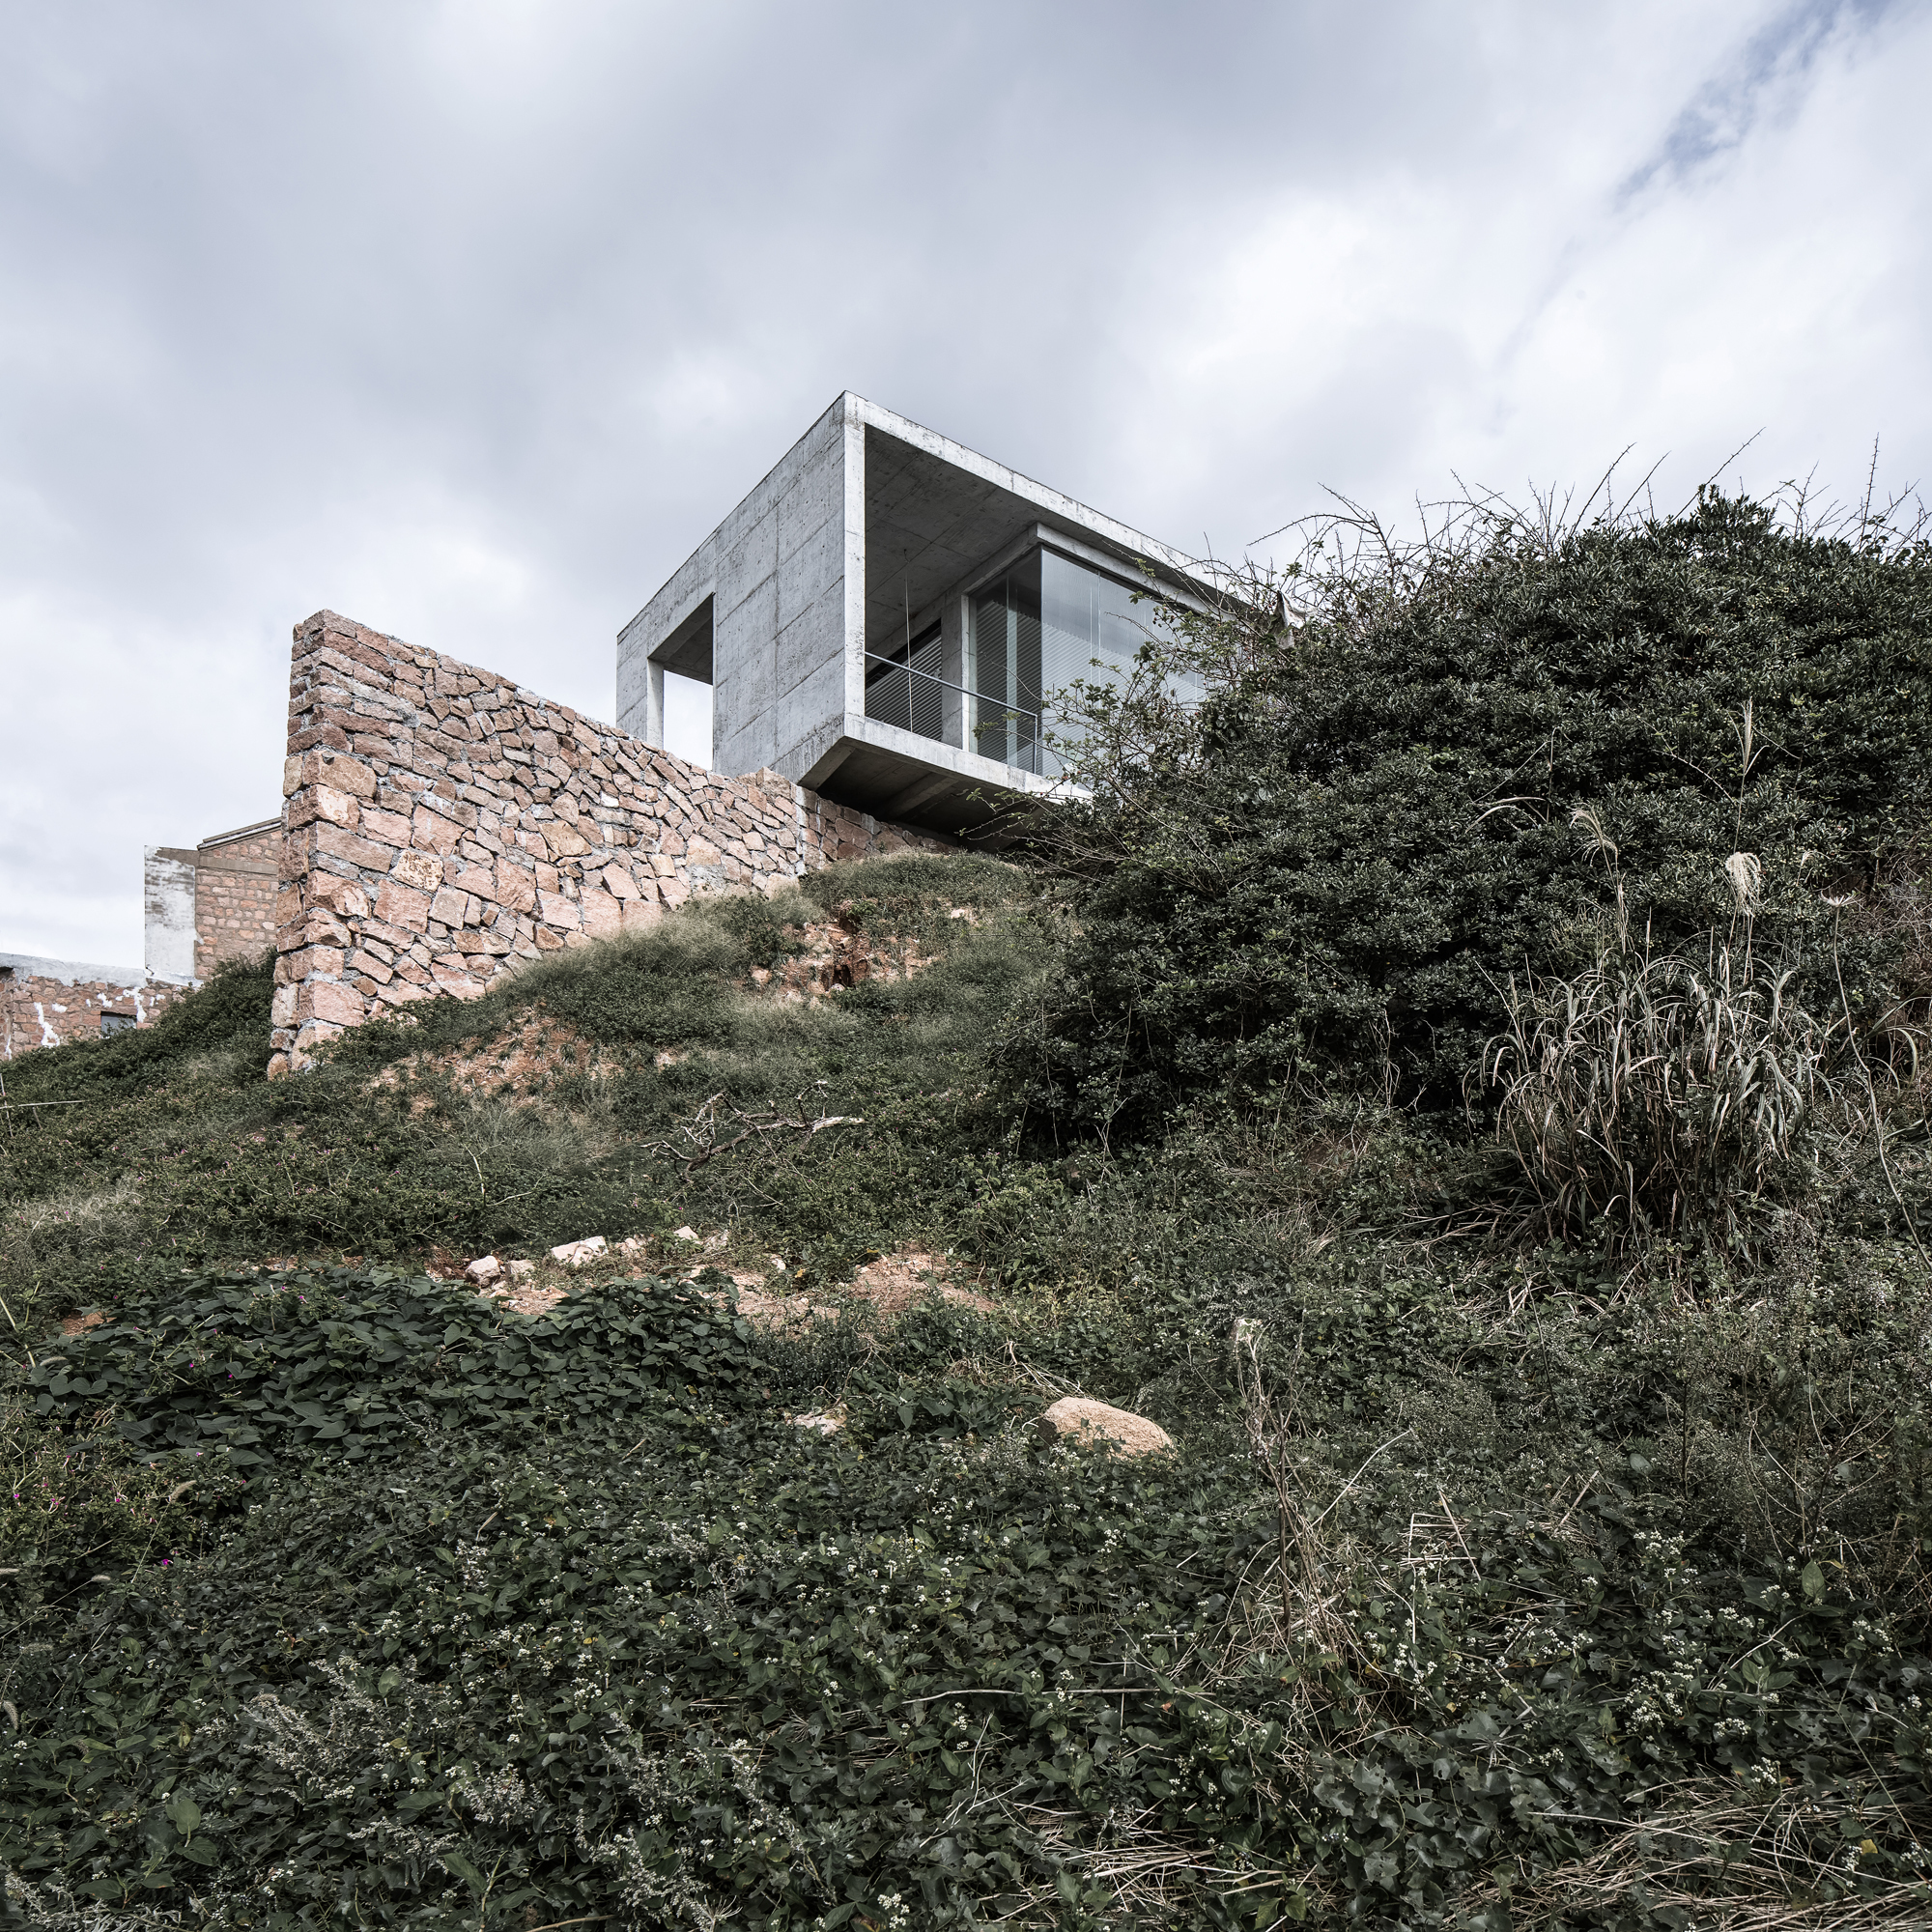 Rural Design Ruraldesign: Gallery Of Rural House Renovation In Zhoushan / Evolution